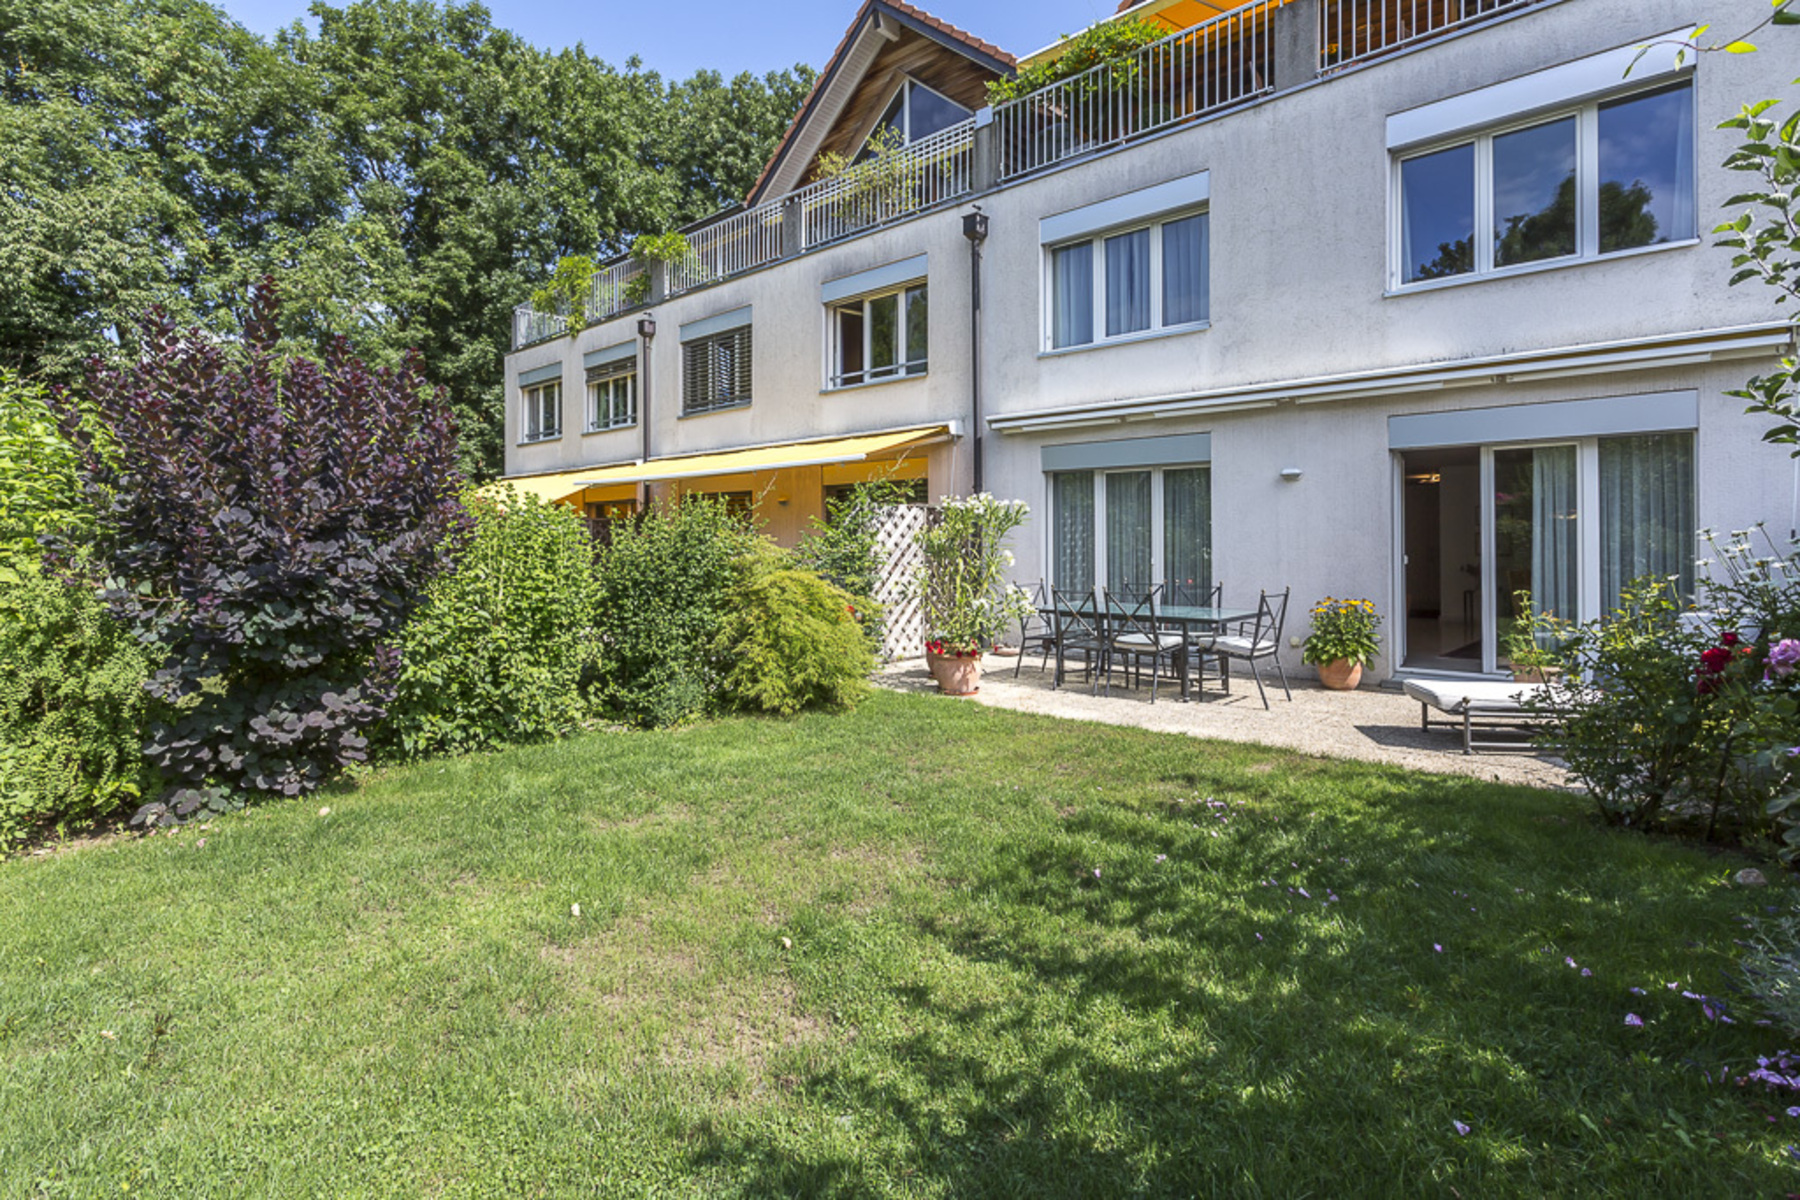 Apartment for Sale at Stunning ground-floor duplex in perfect condition Drize Troinex, Geneva, 1256 Switzerland